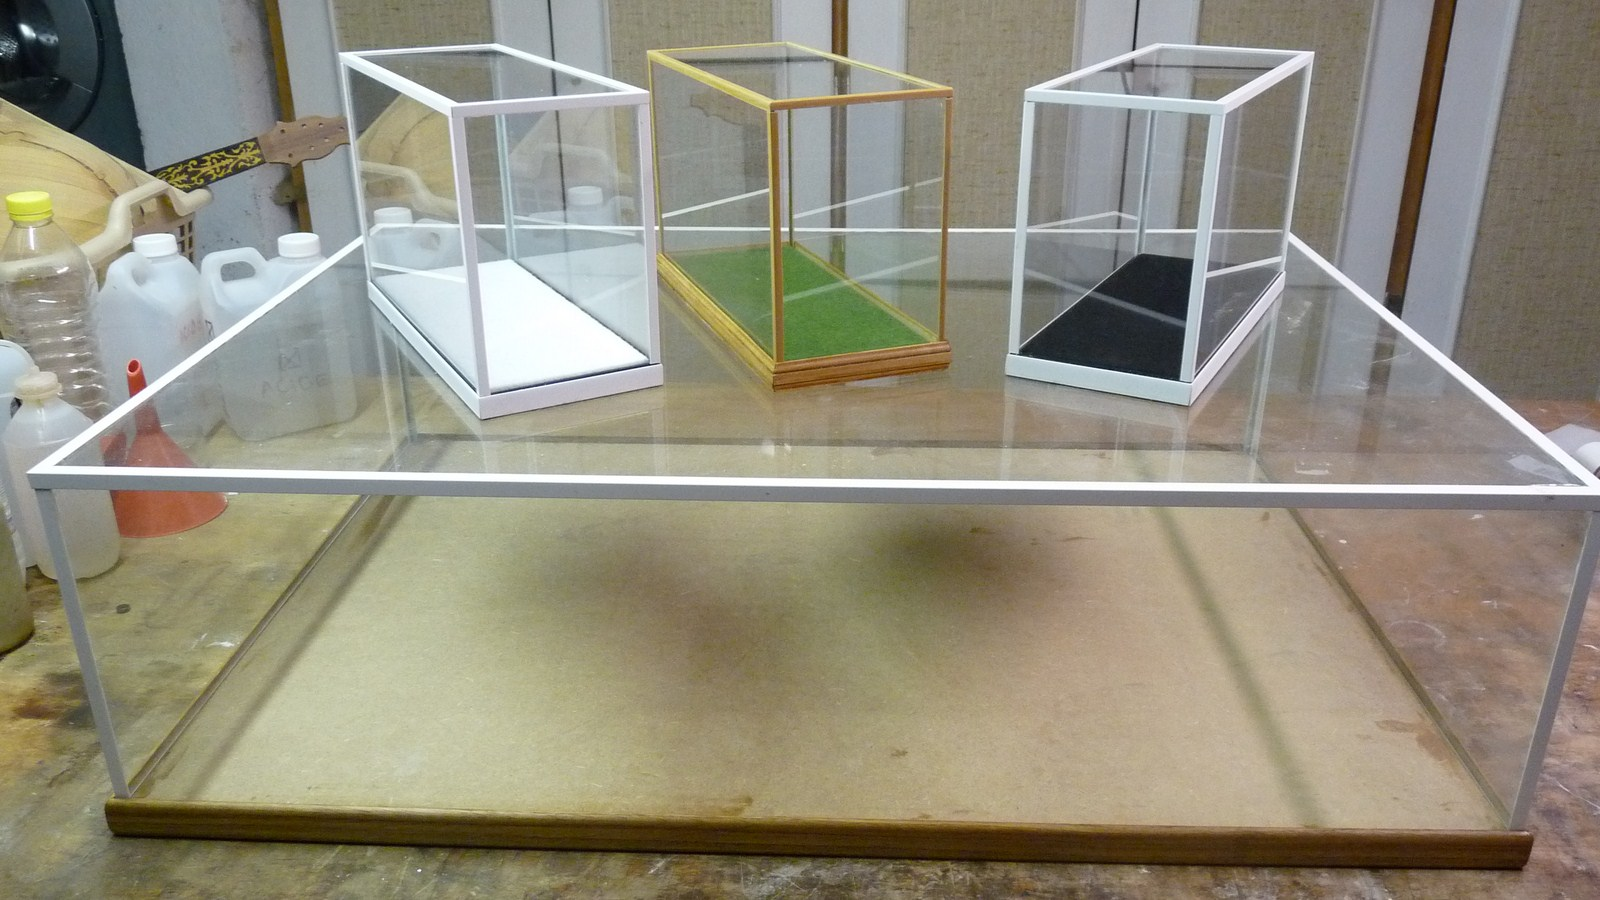 Fabriquer ses propres vitrines en verre 17071907272023134915156561